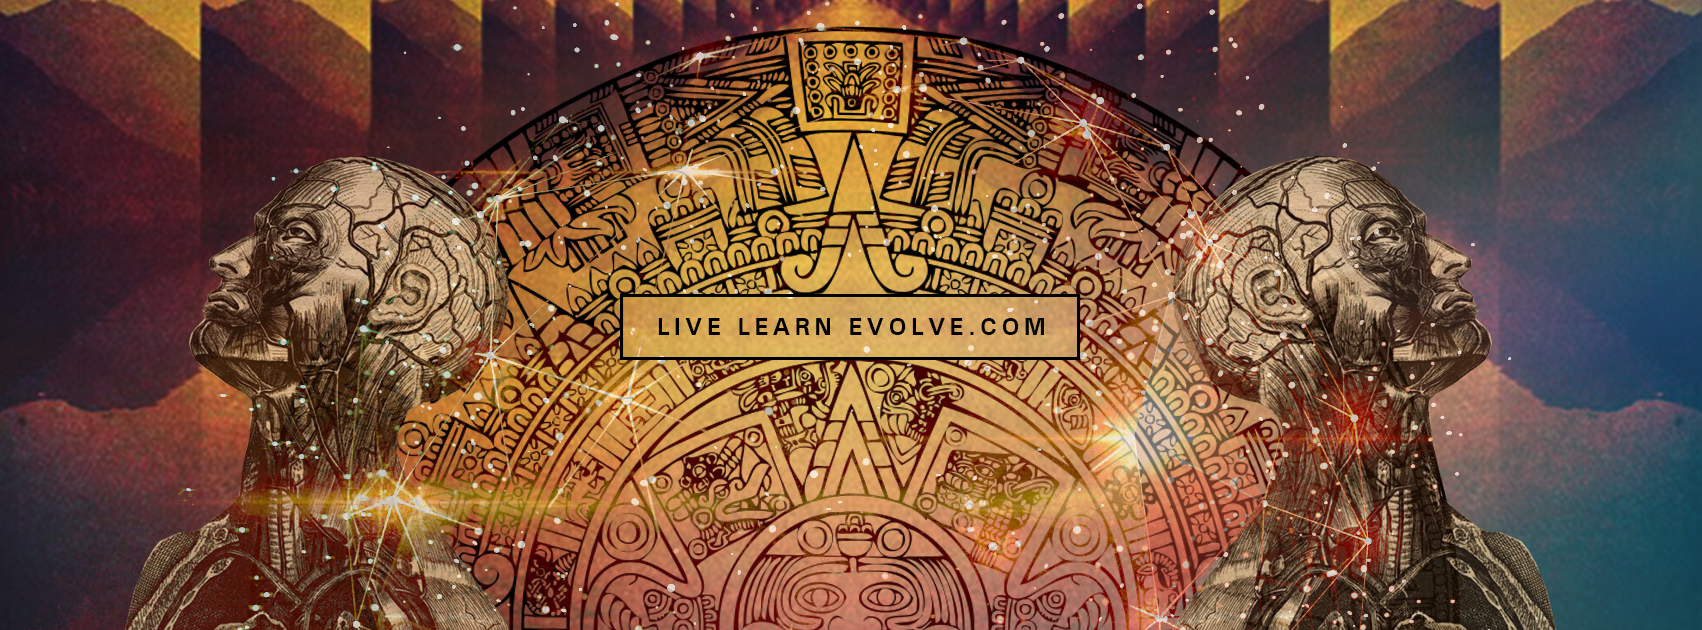 livelearnevolve_facebook_cover